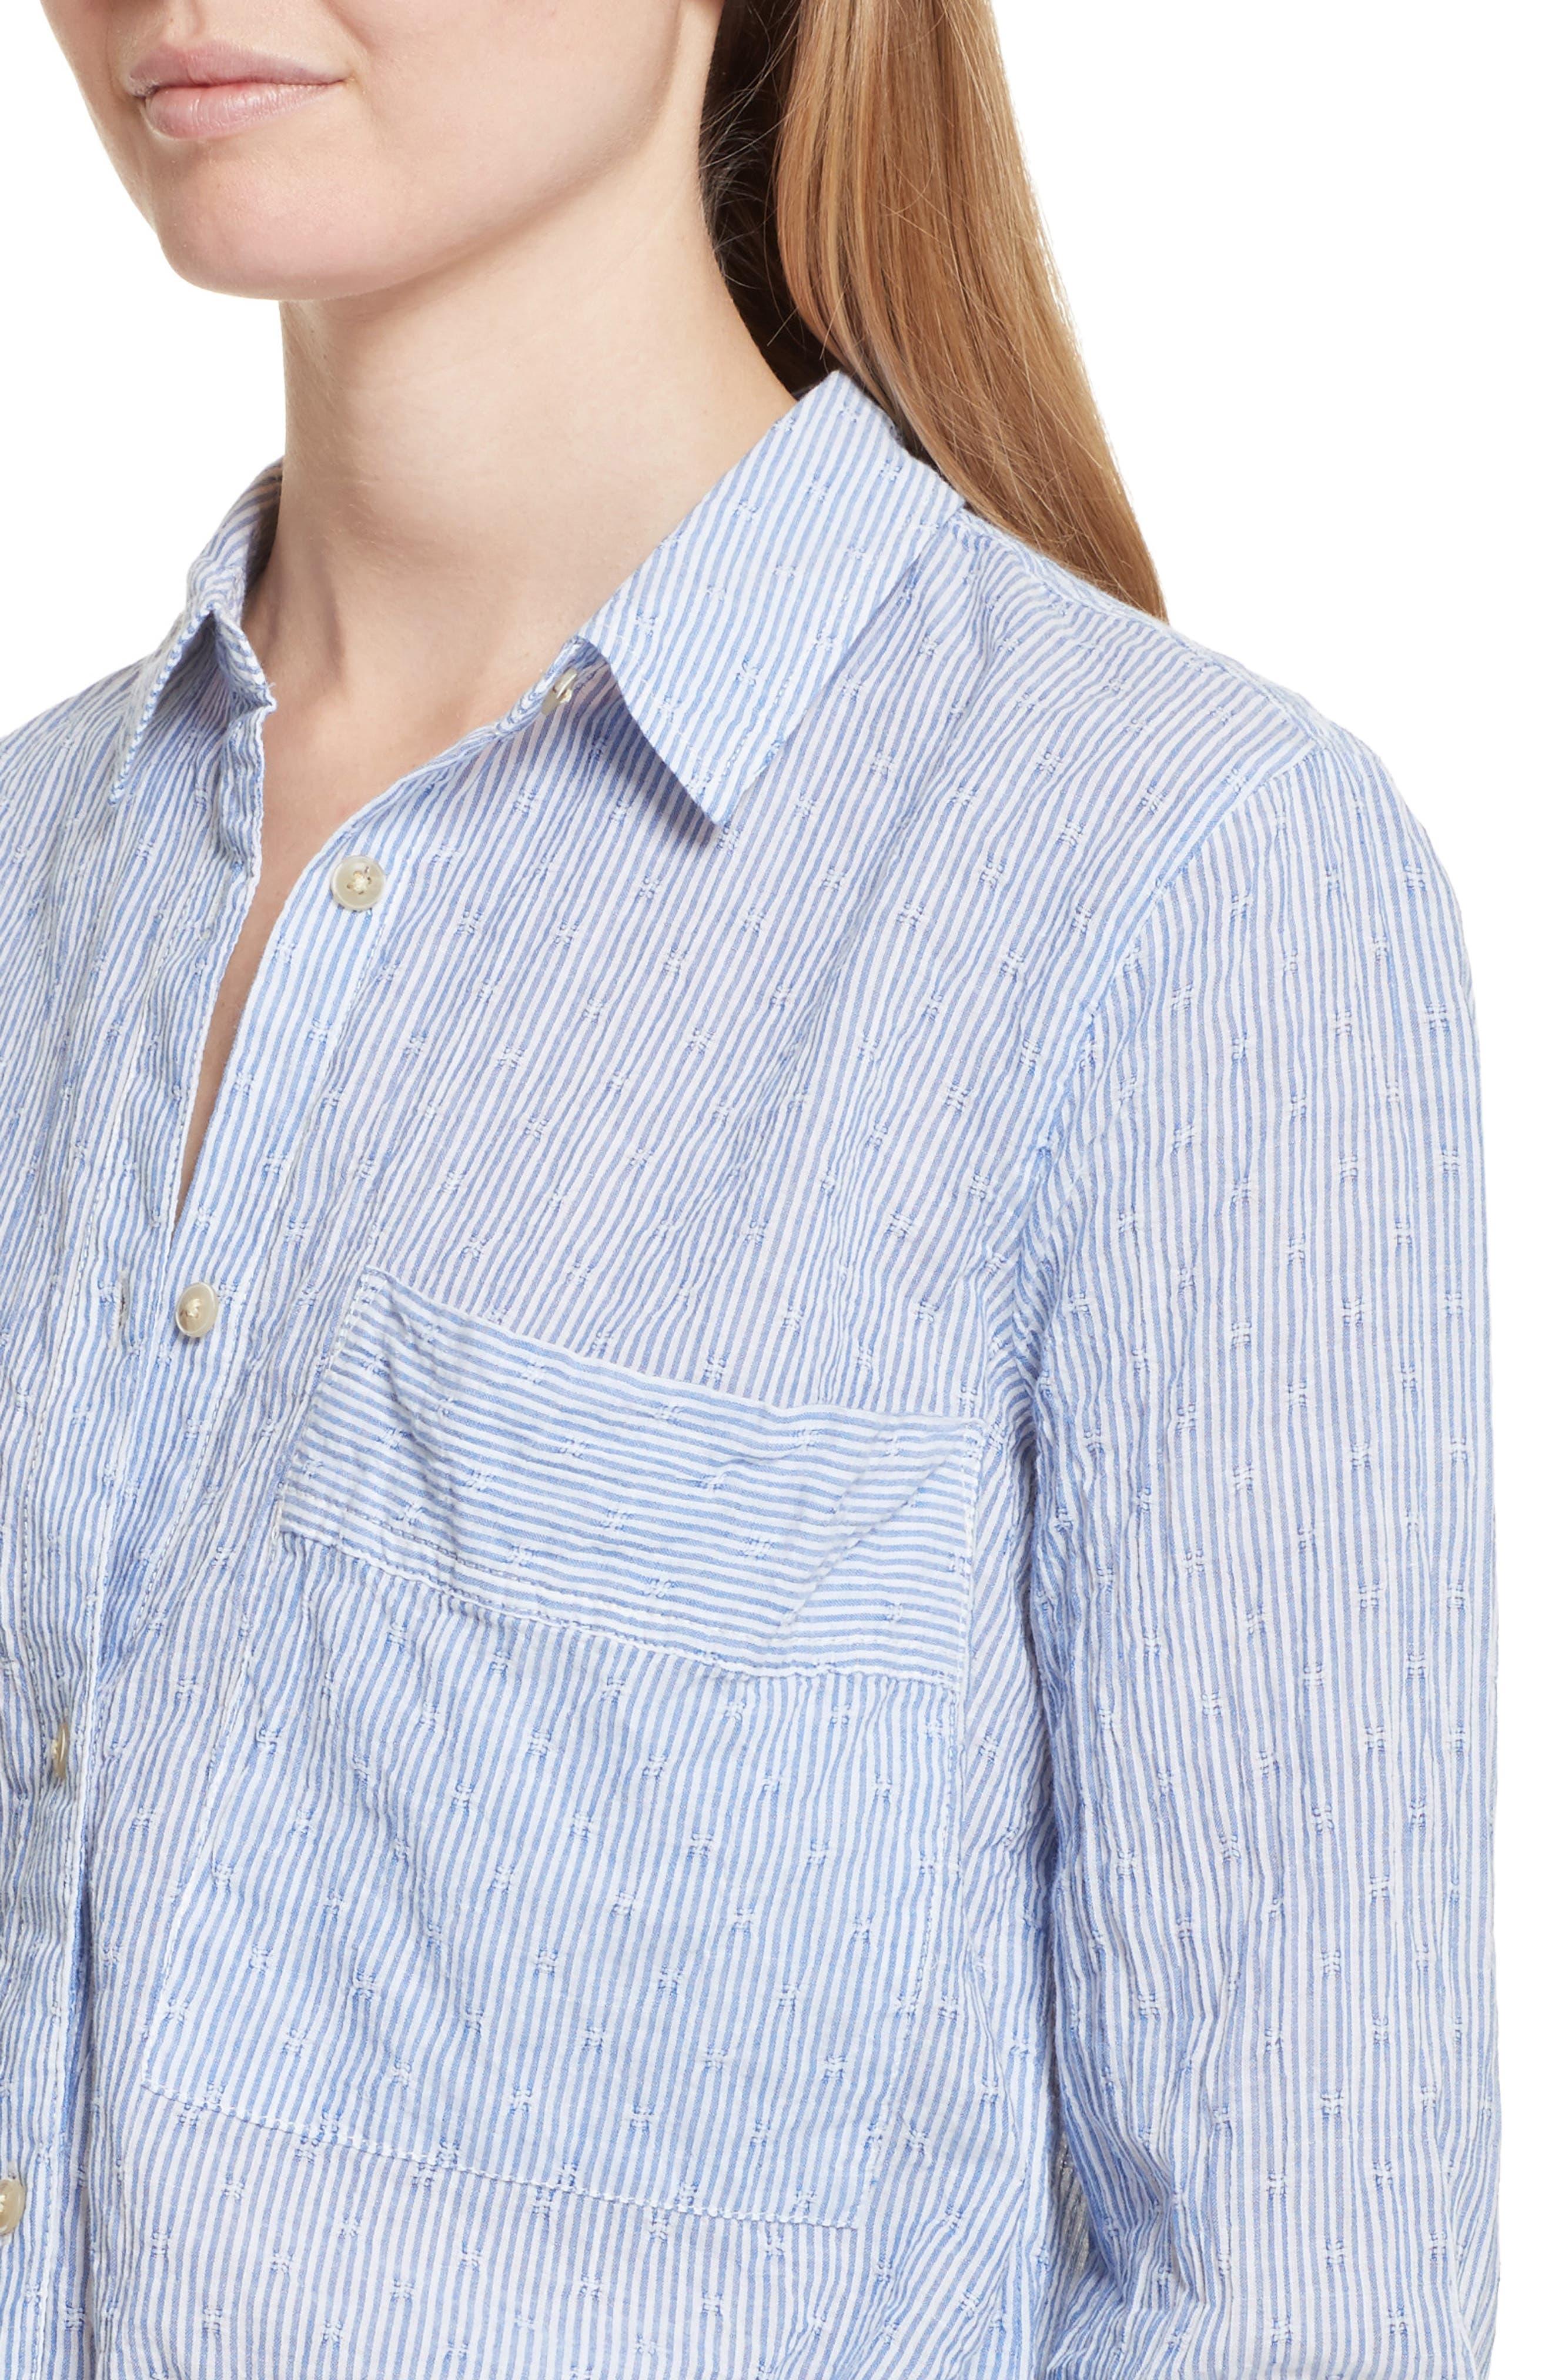 No Limits Stripe Stretch Cotton Shirt,                             Alternate thumbnail 4, color,                             400